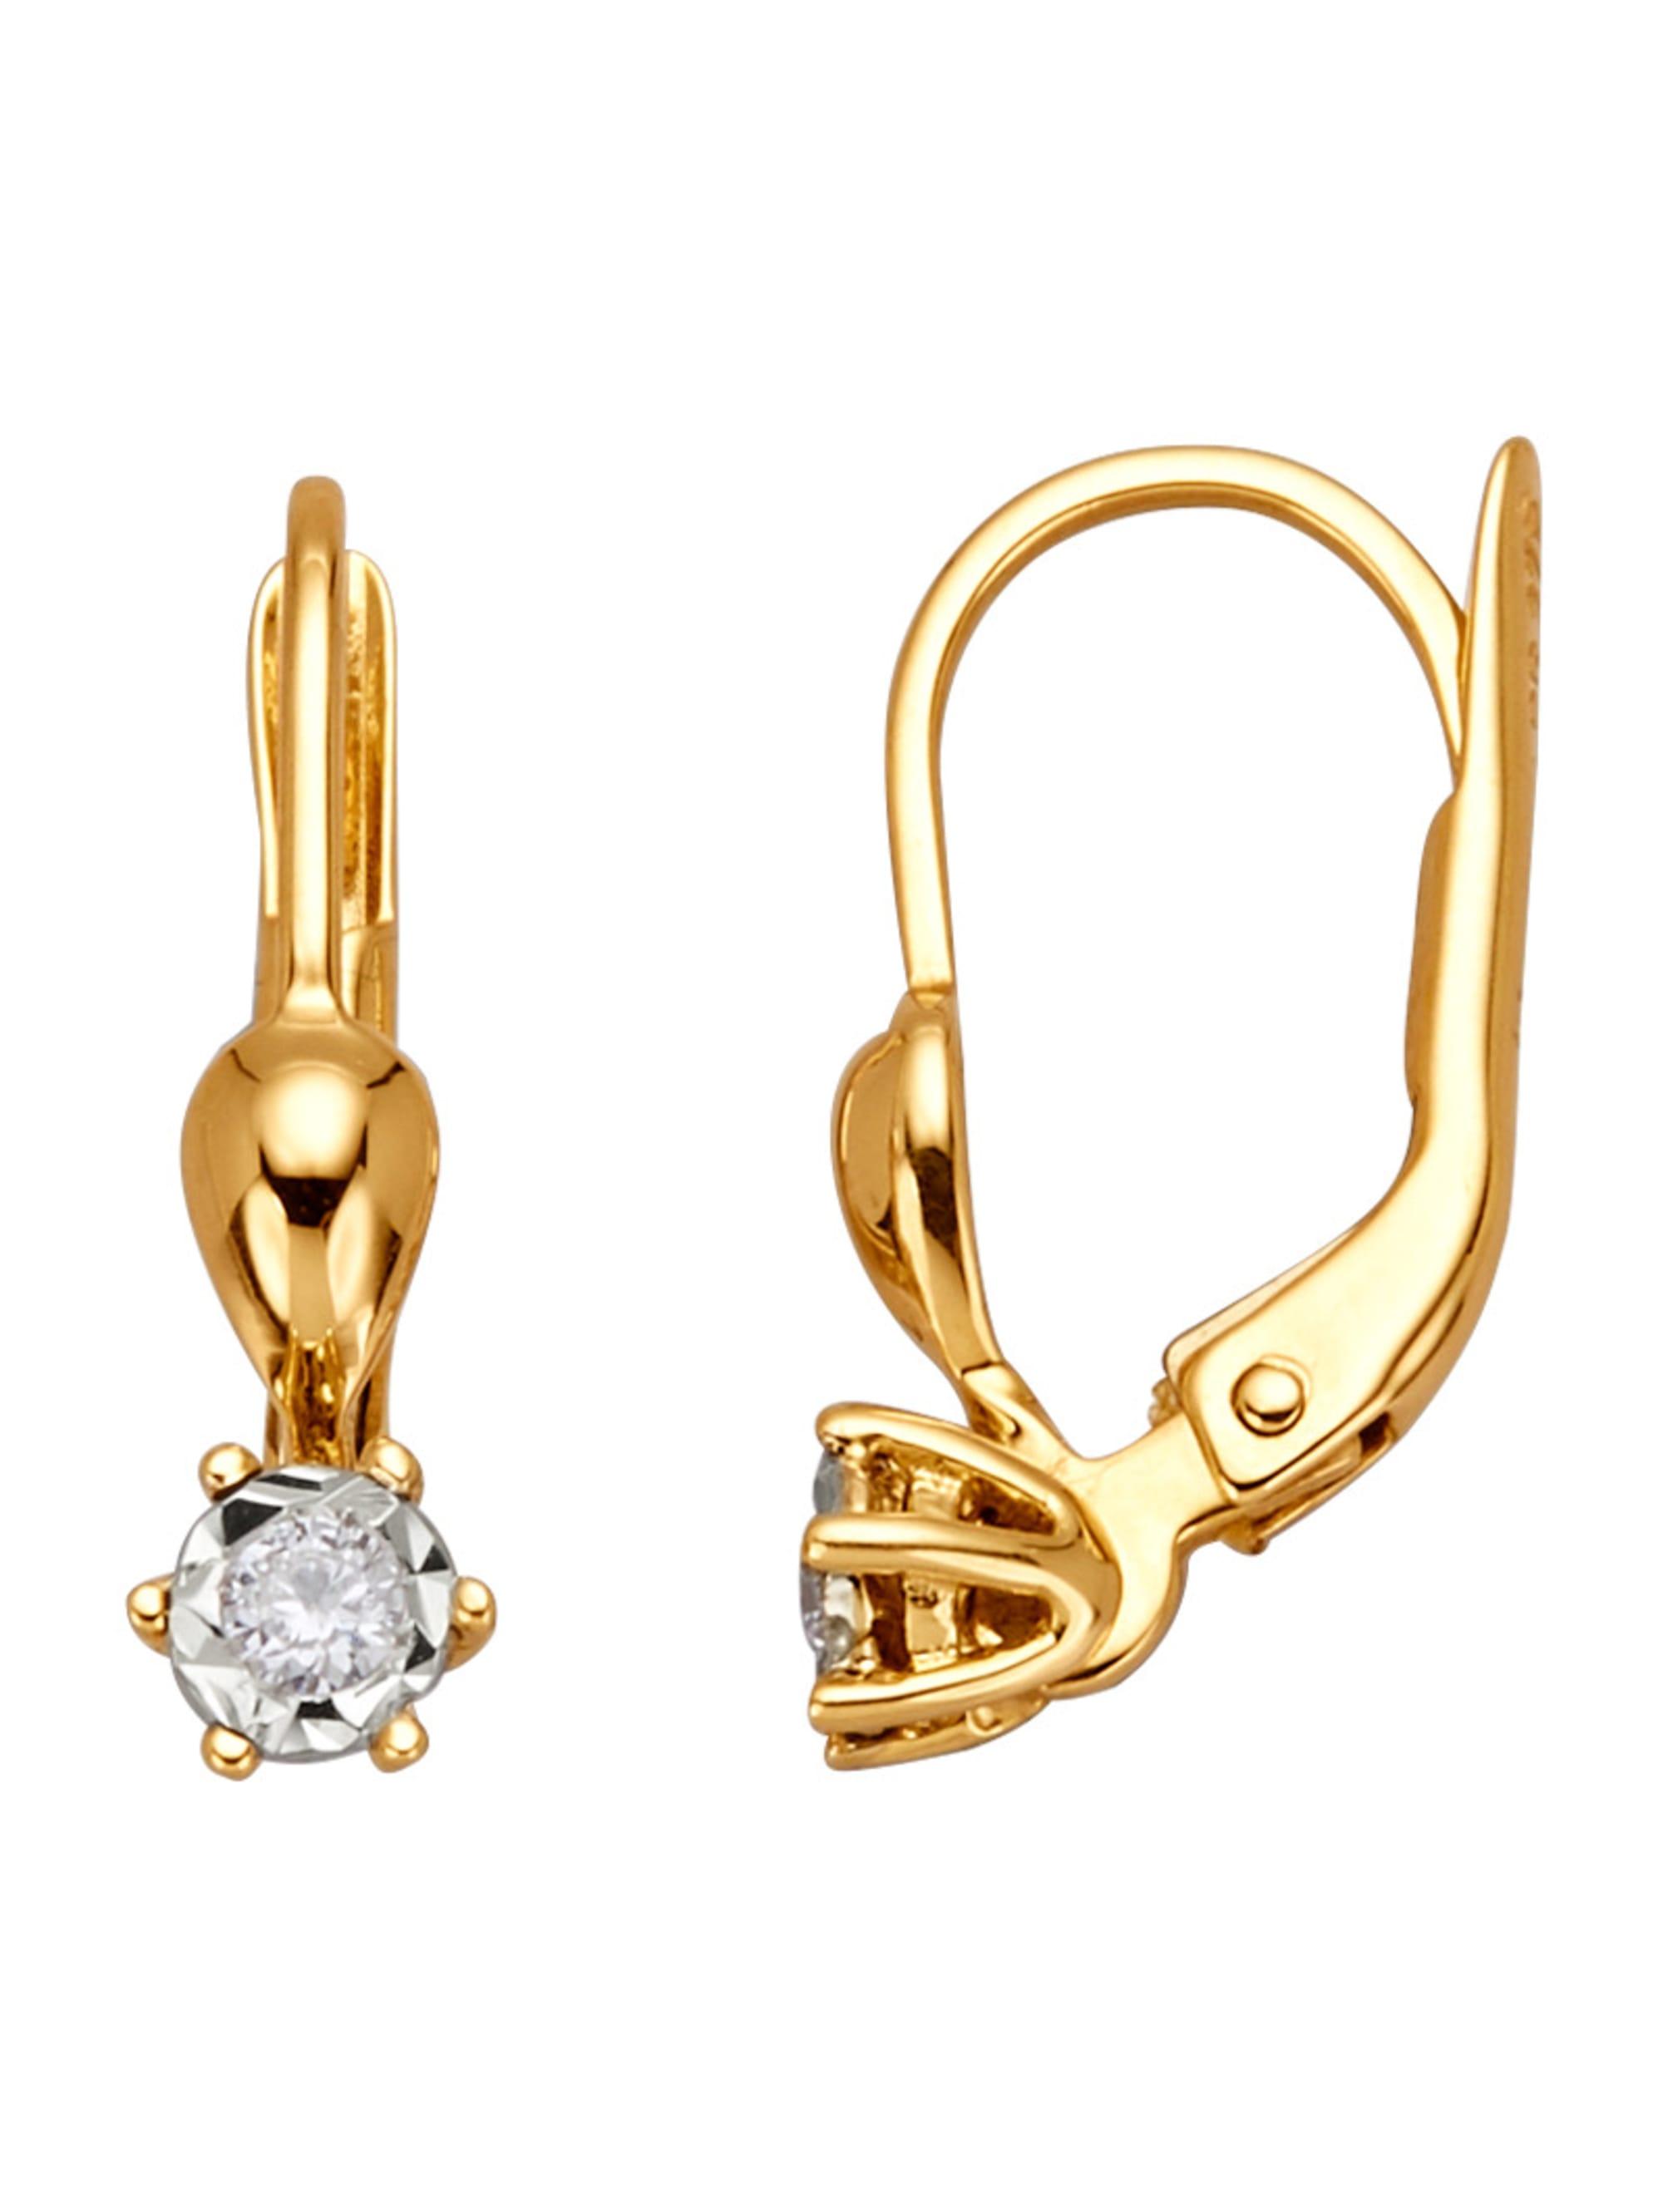 Ohrringe mit Diamanten pu2Mf